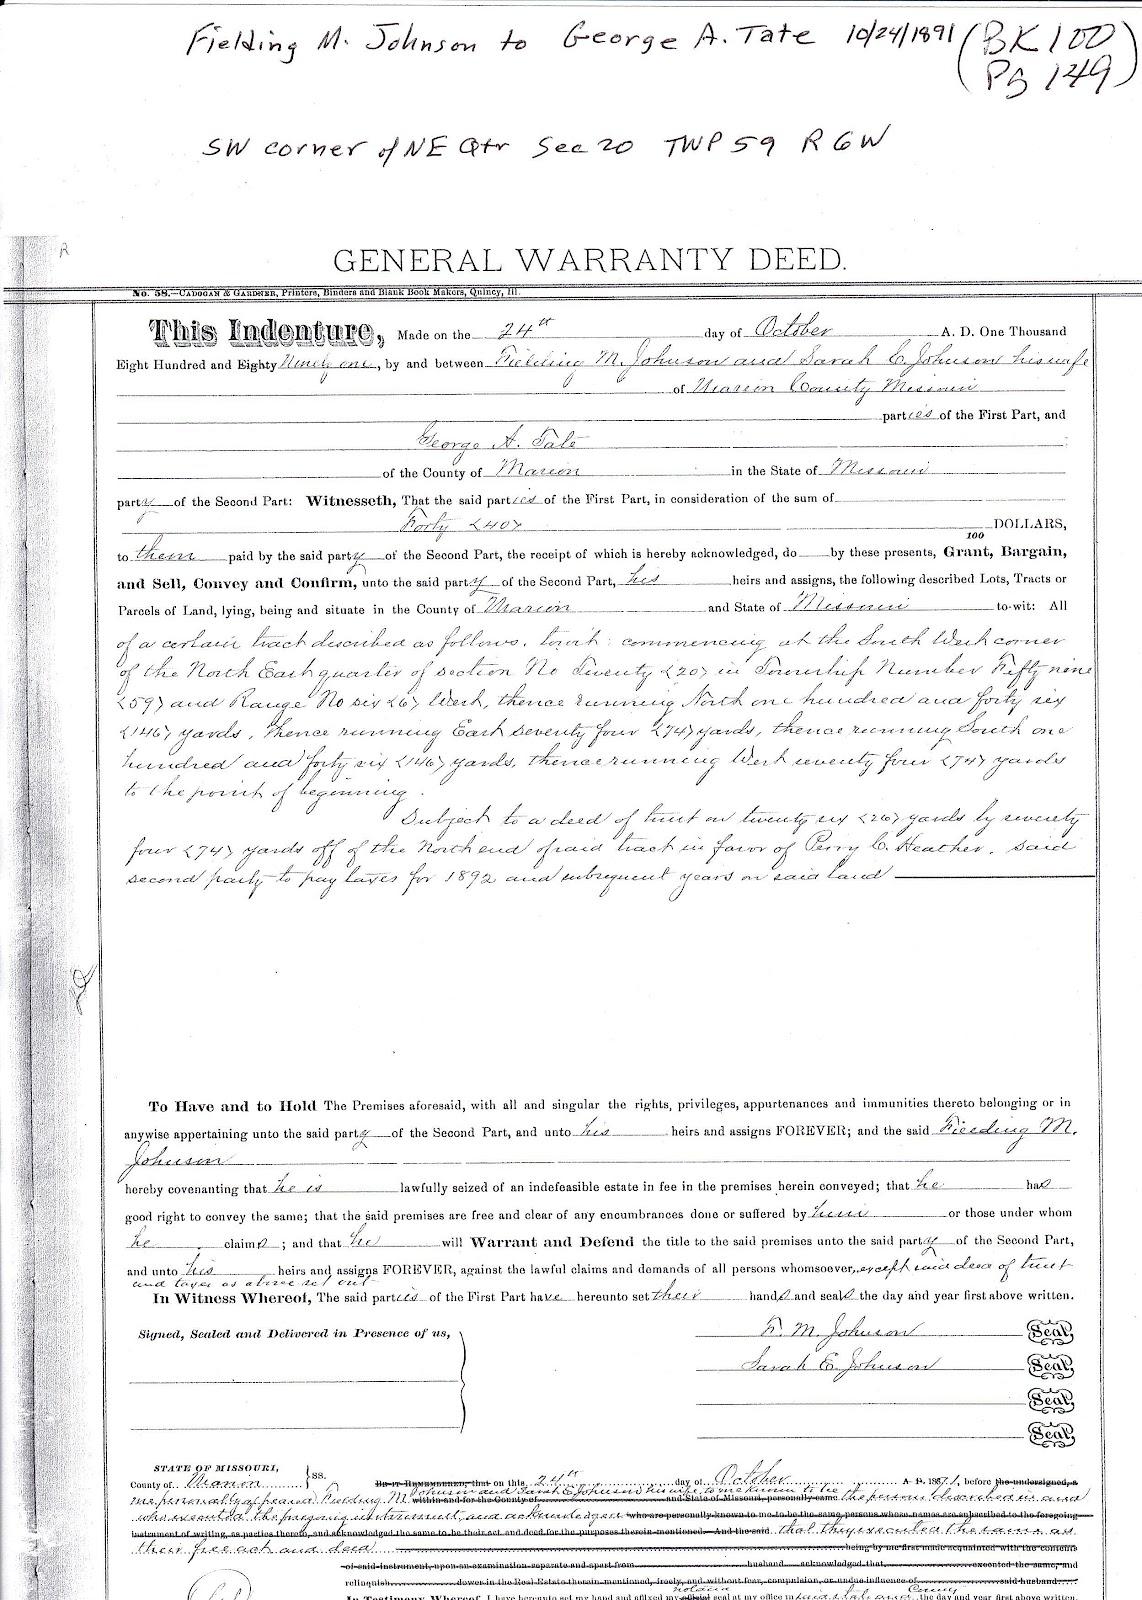 1891 Deed.jpg